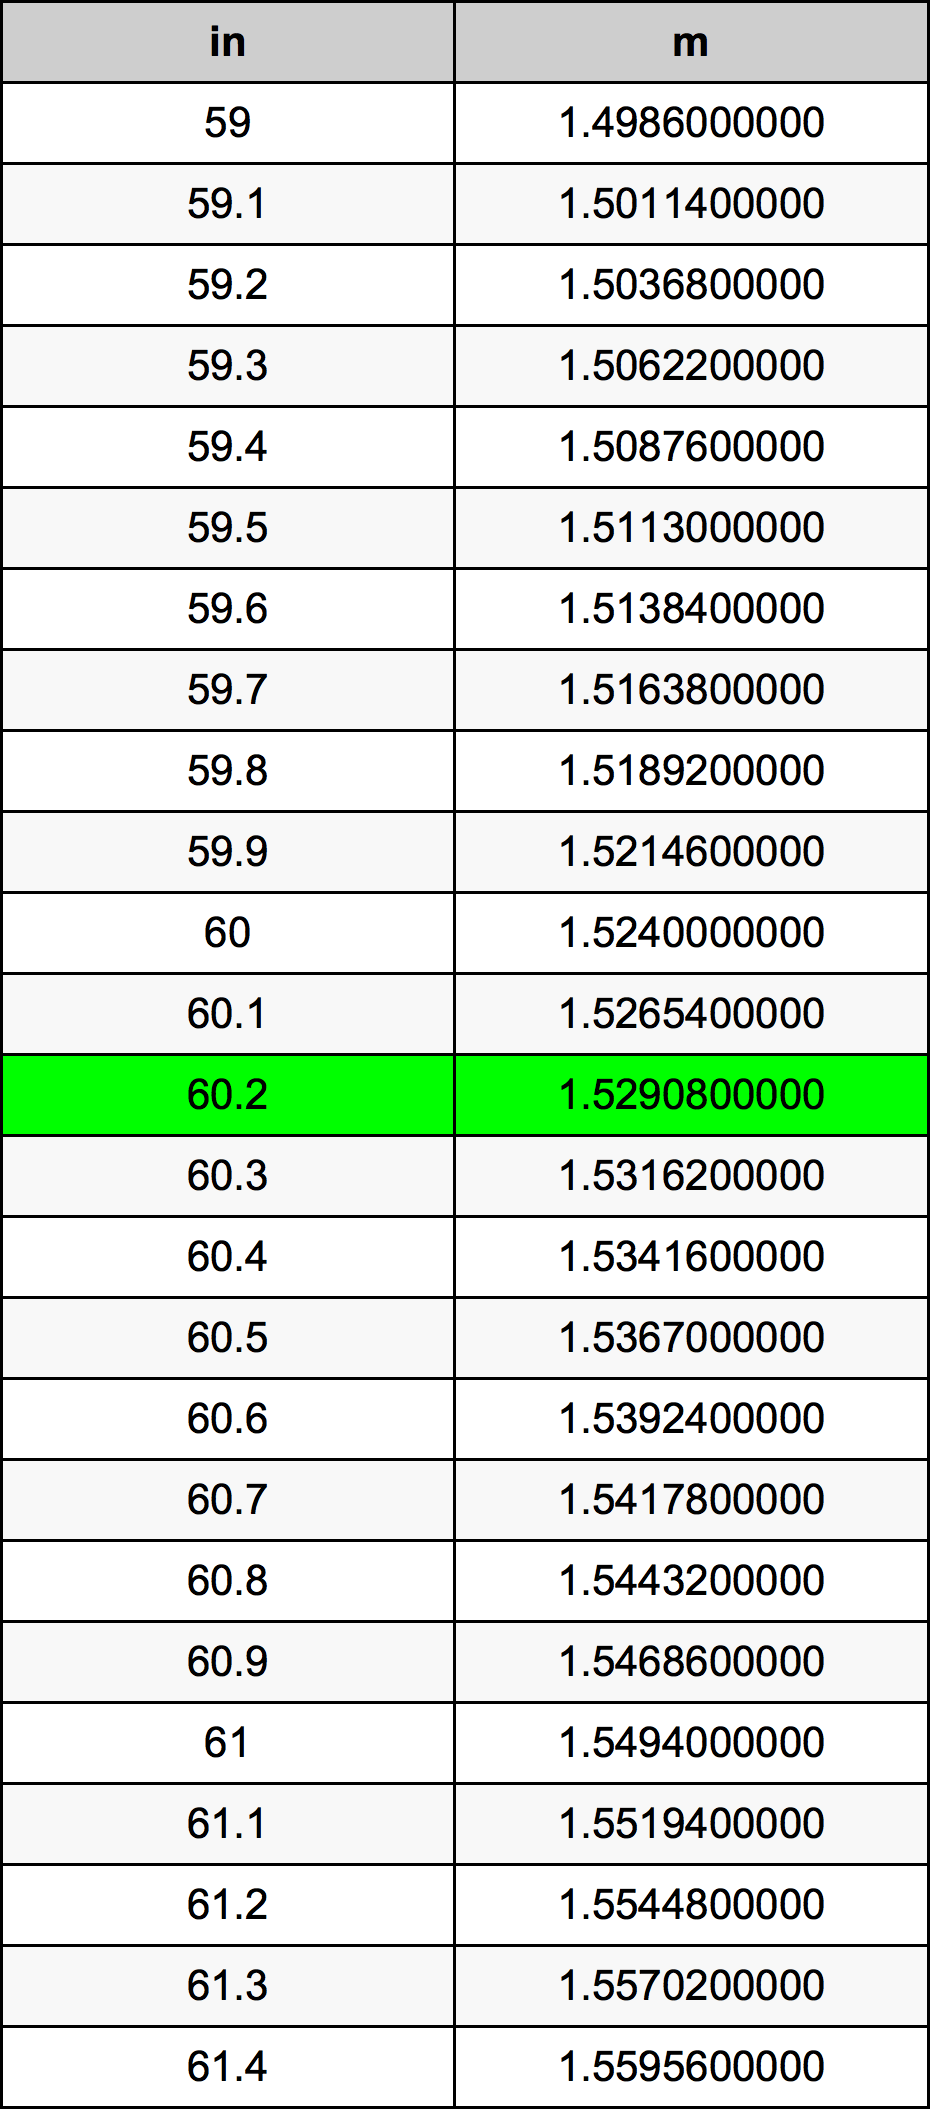 60.2 इंच रूपांतरण सारणी